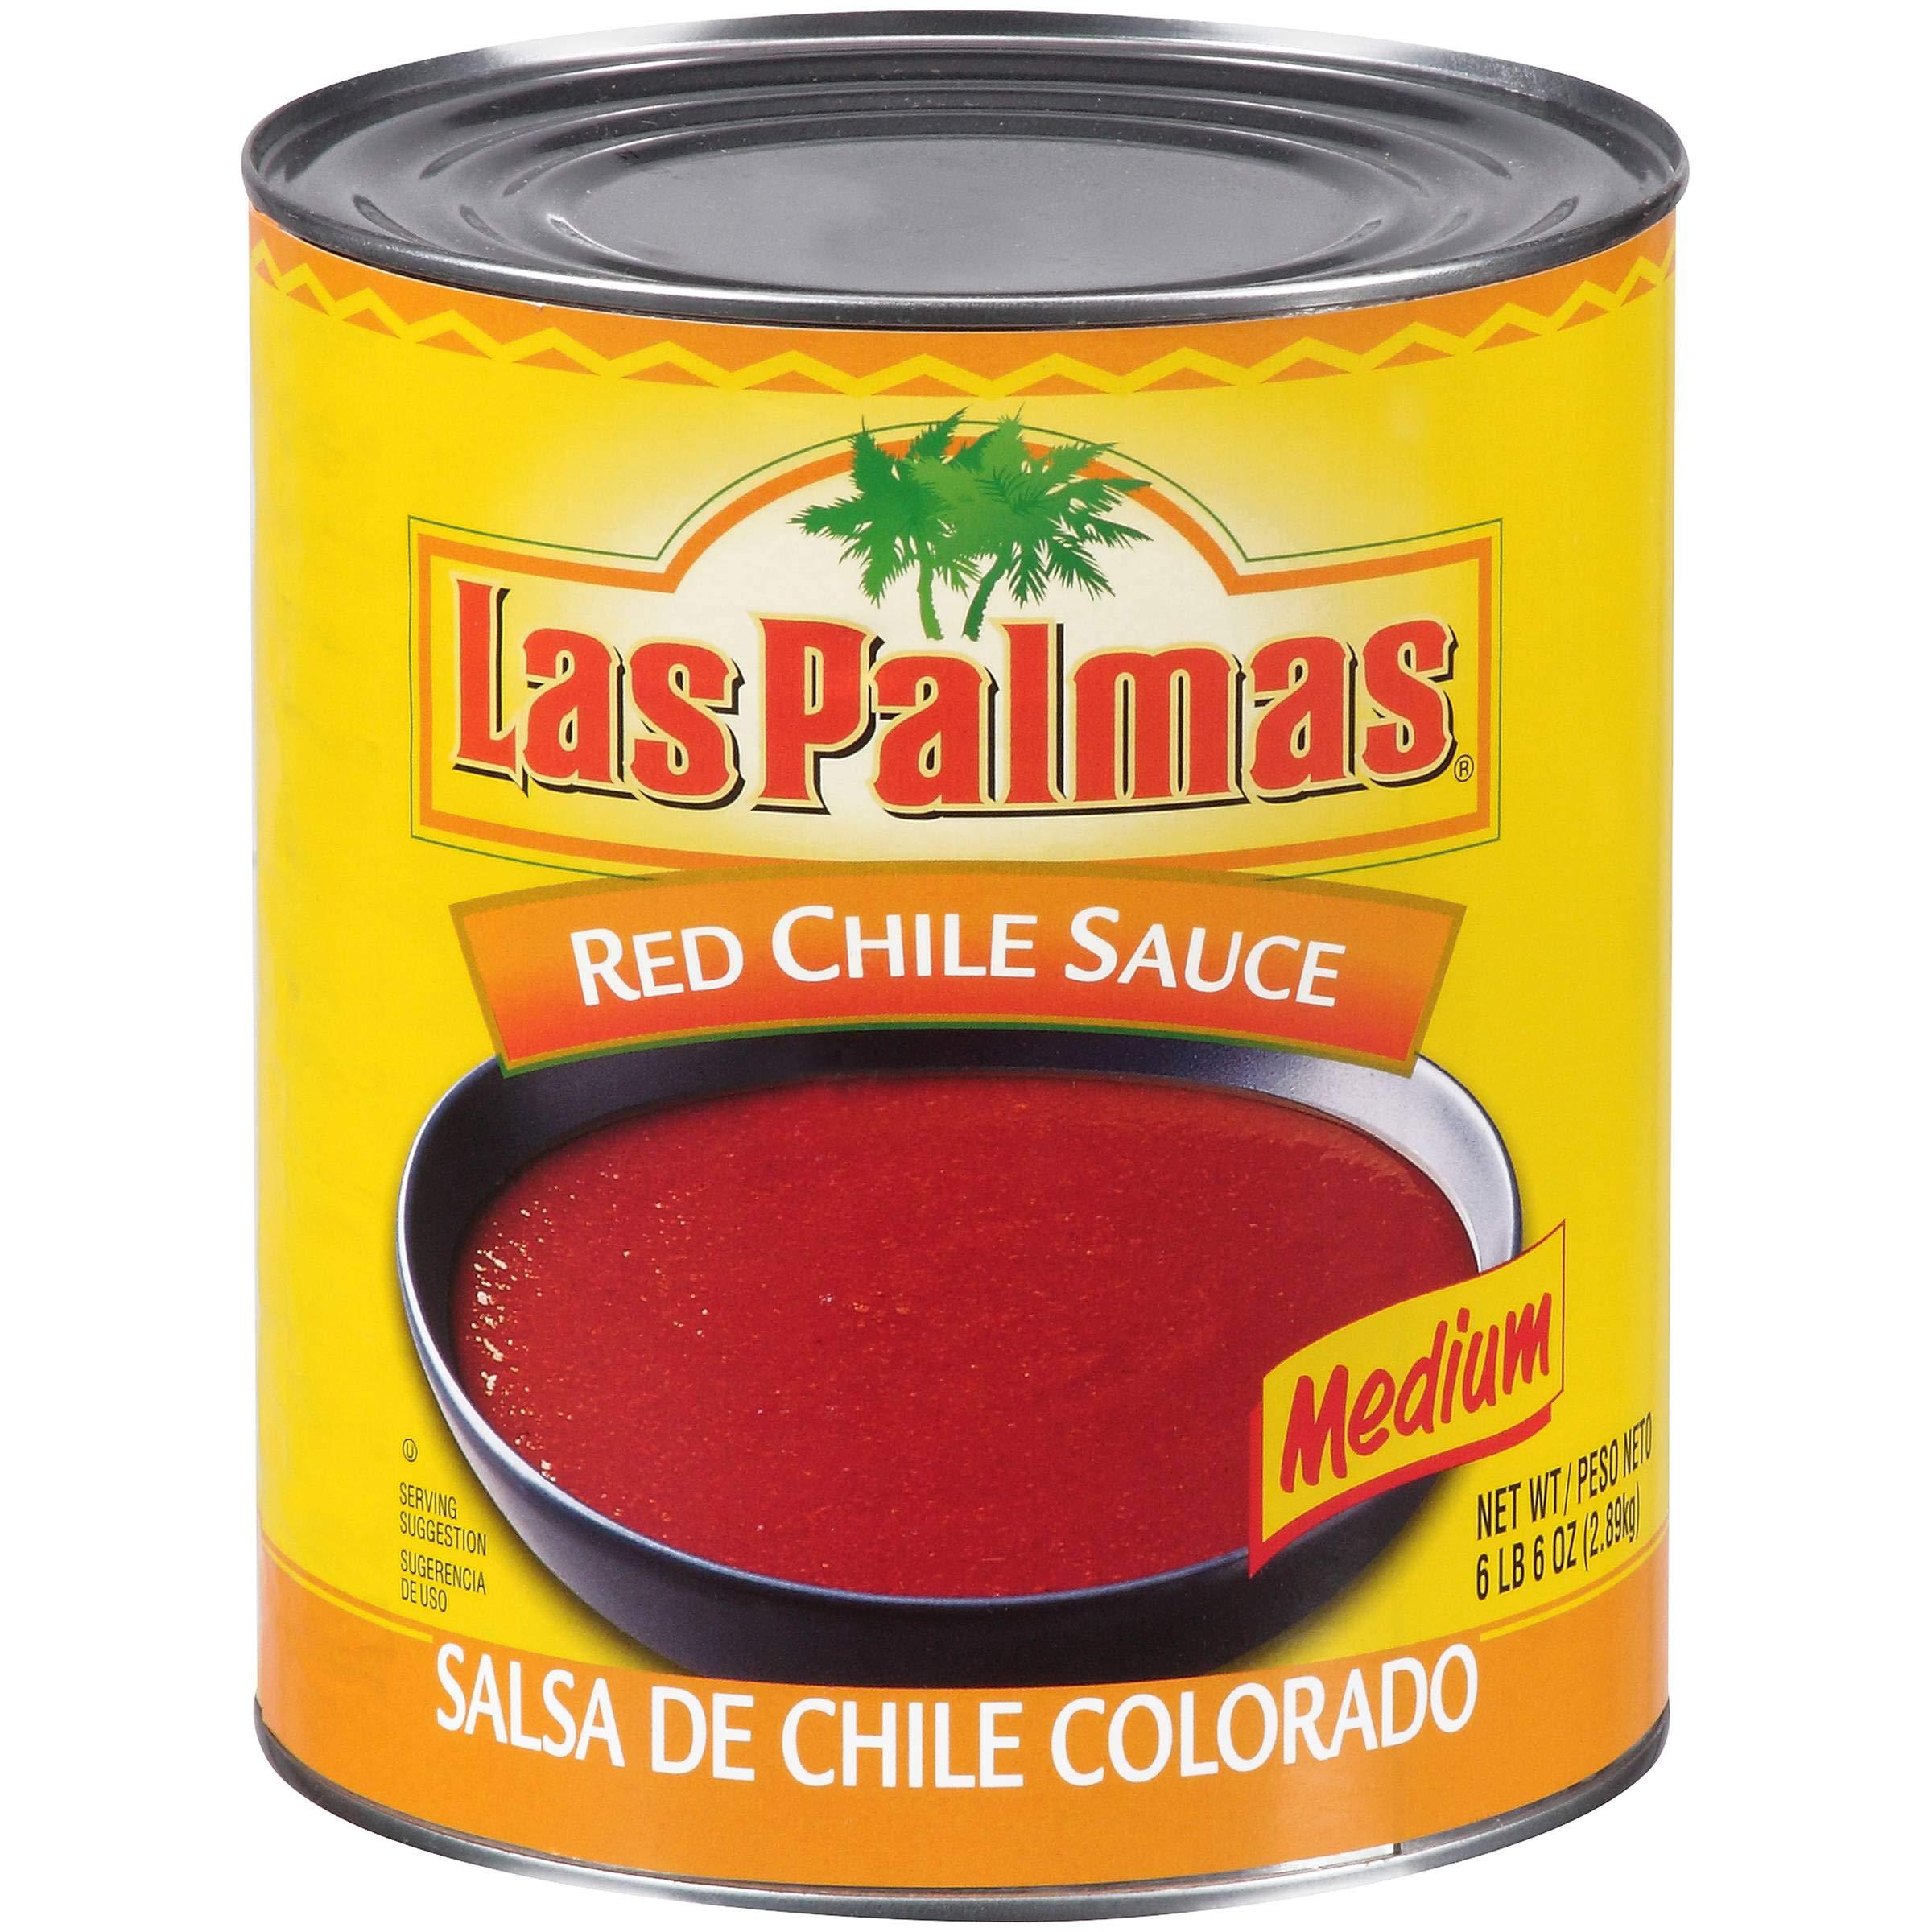 Las Palmas Red Chili Sauce, 102 Ounce -- 6 Case